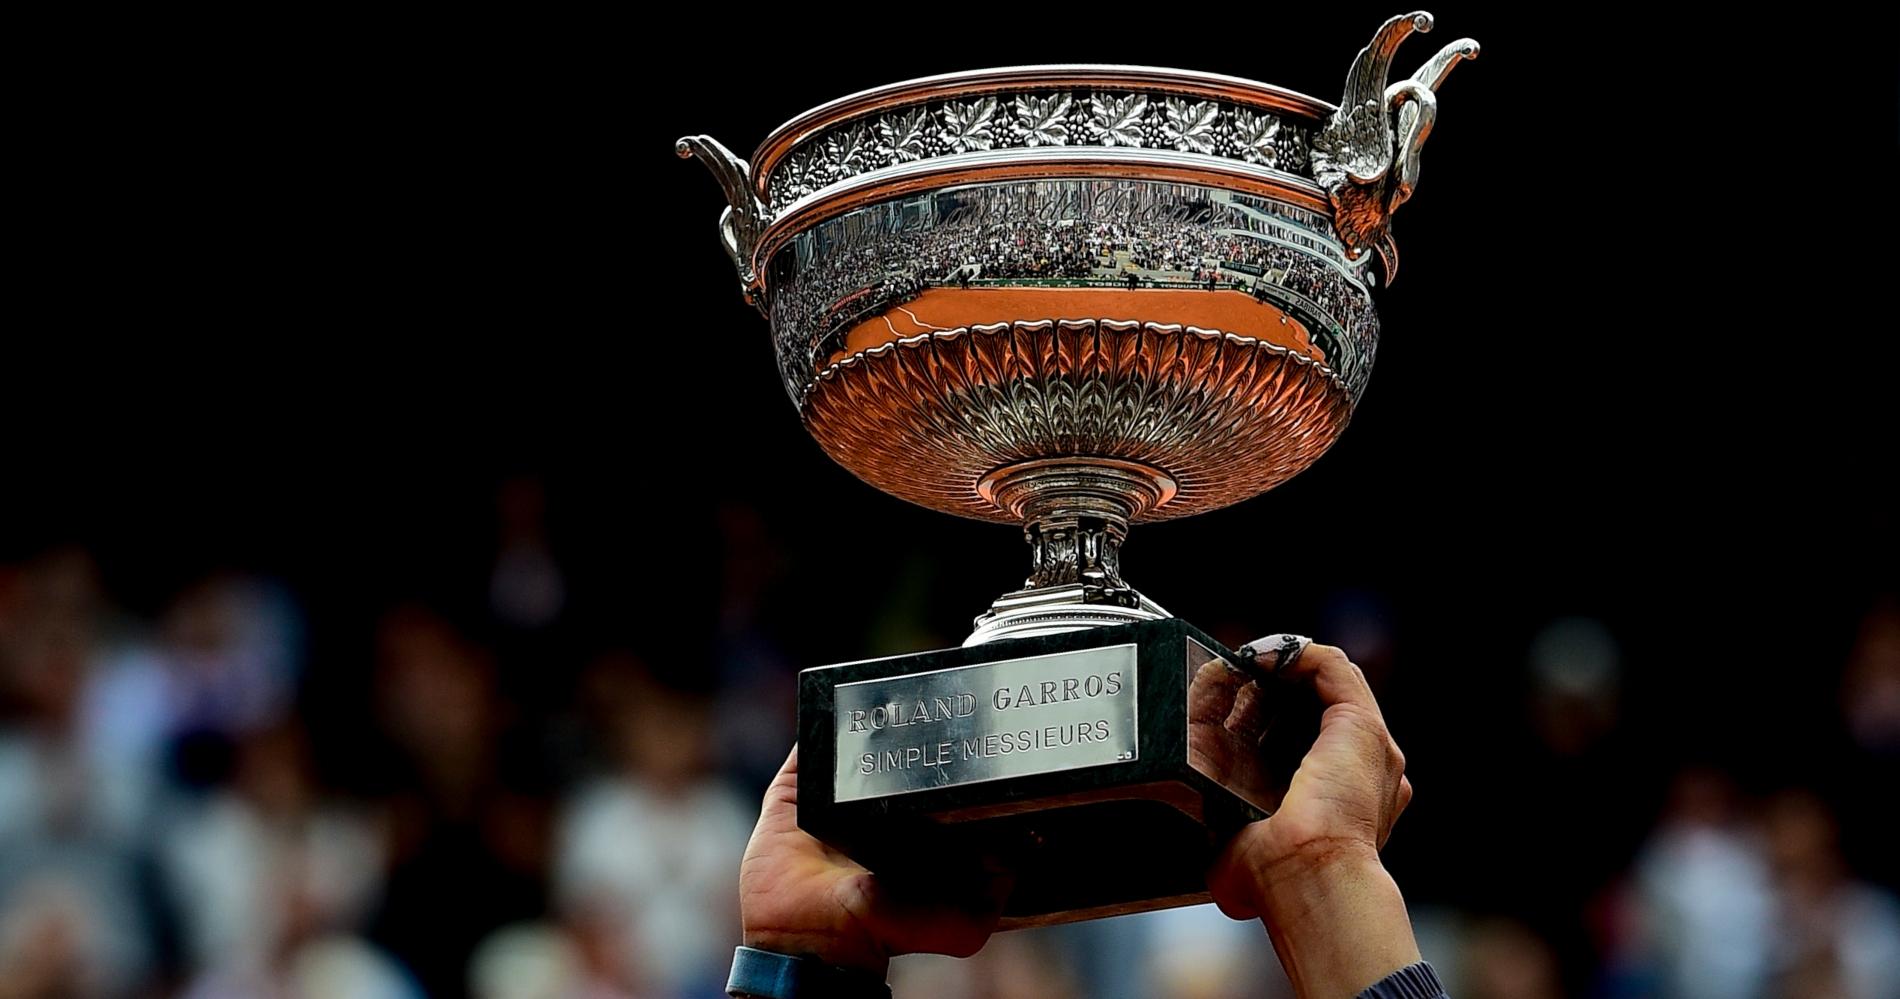 Roland-Garros' men trophy